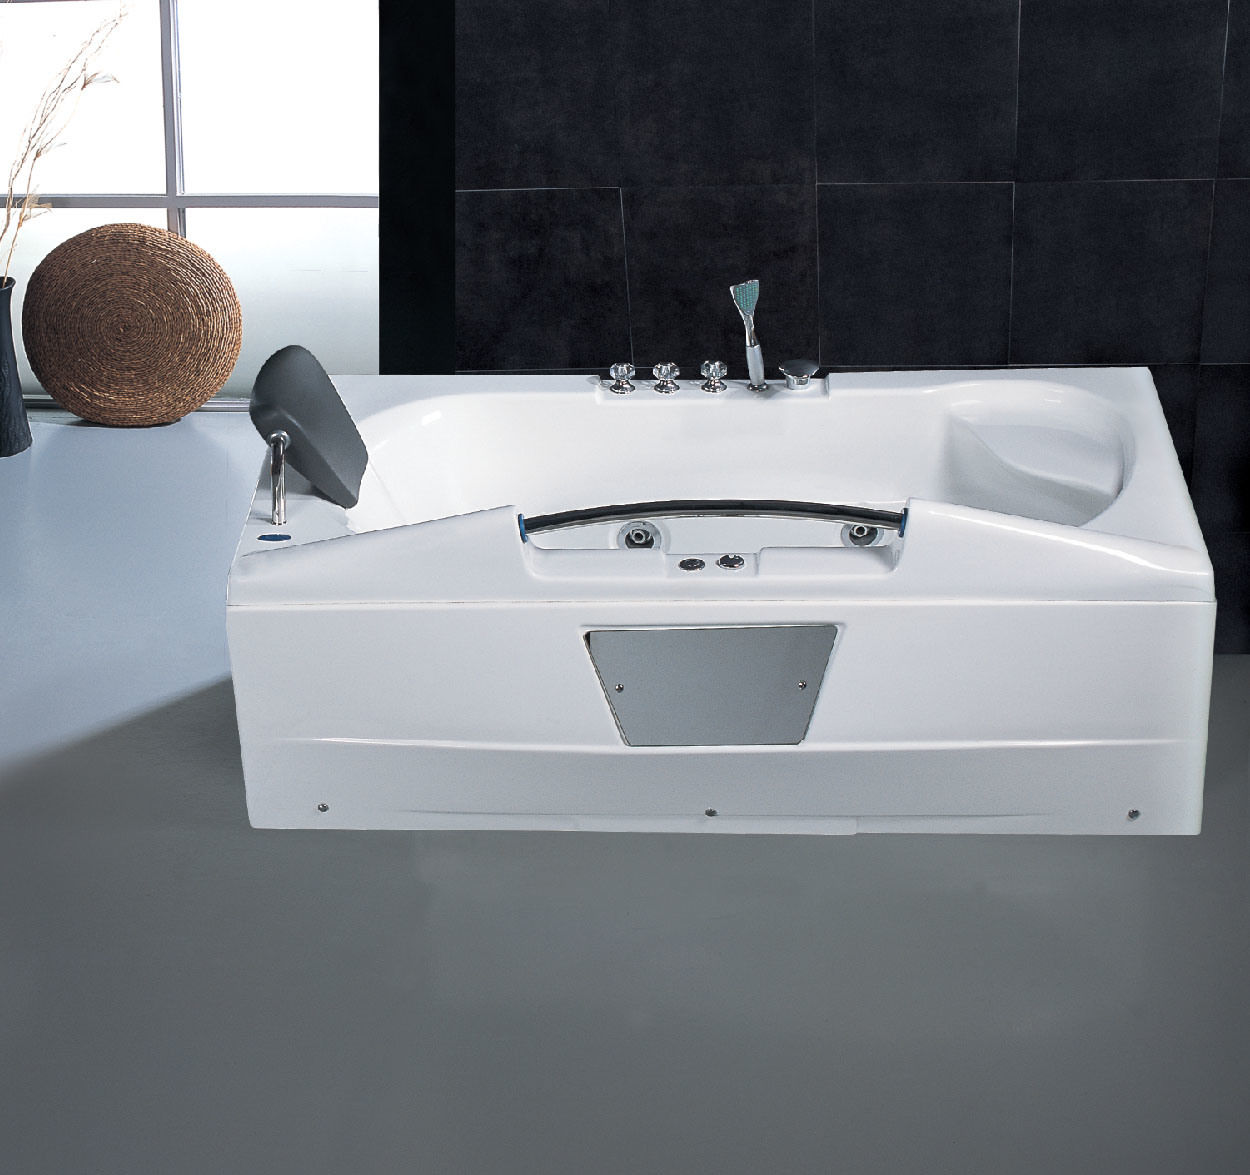 home gt whirlpool bathtubs gt corner whirlpool bathtub with